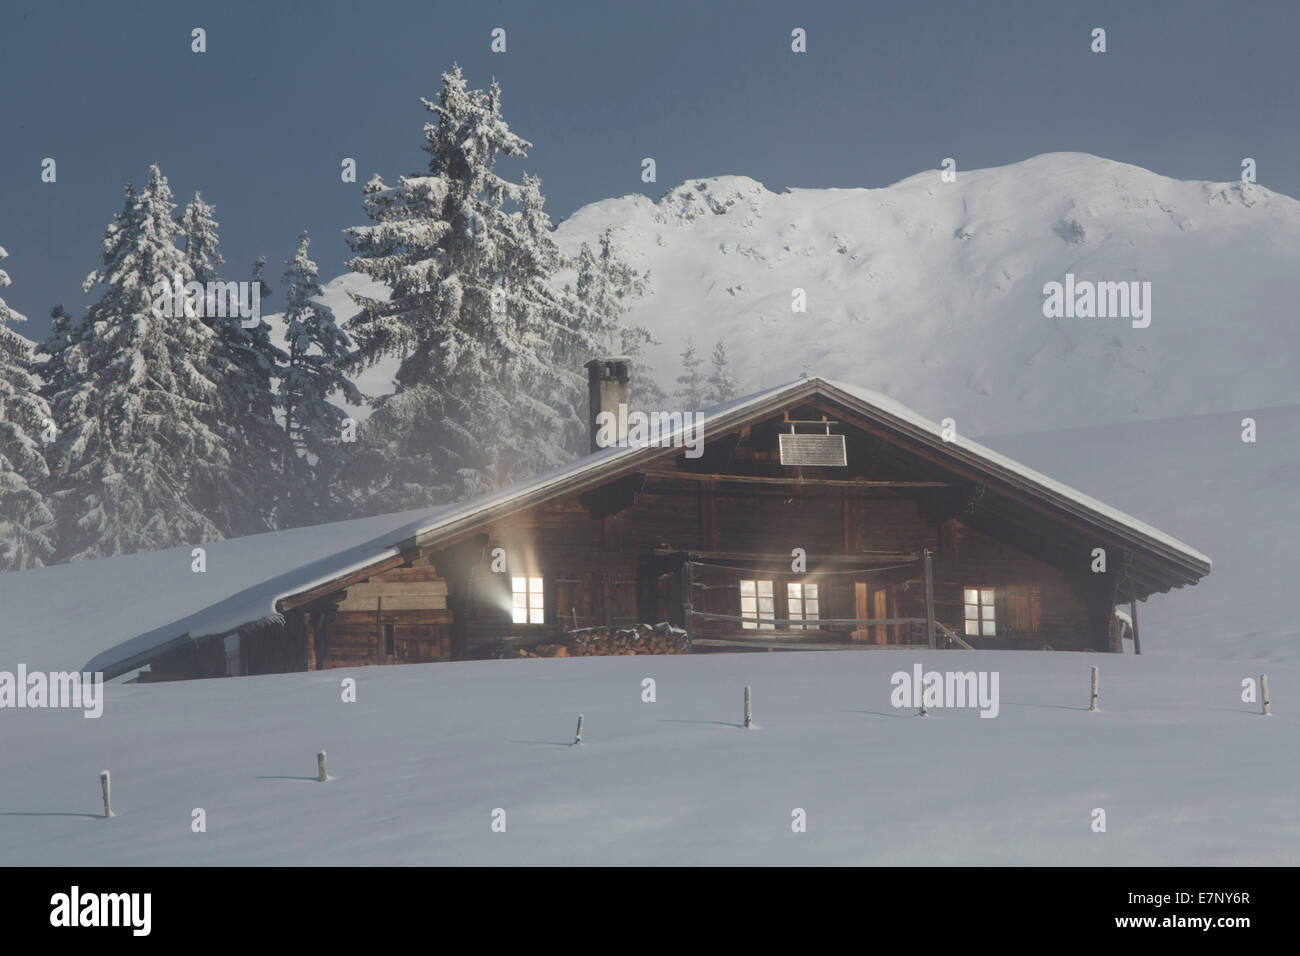 alpine cabin, Jaunpass, mountain, mountains, hut, house, alpine cabin, winter, canton Bern, Switzerland, Europe, - Stock Image